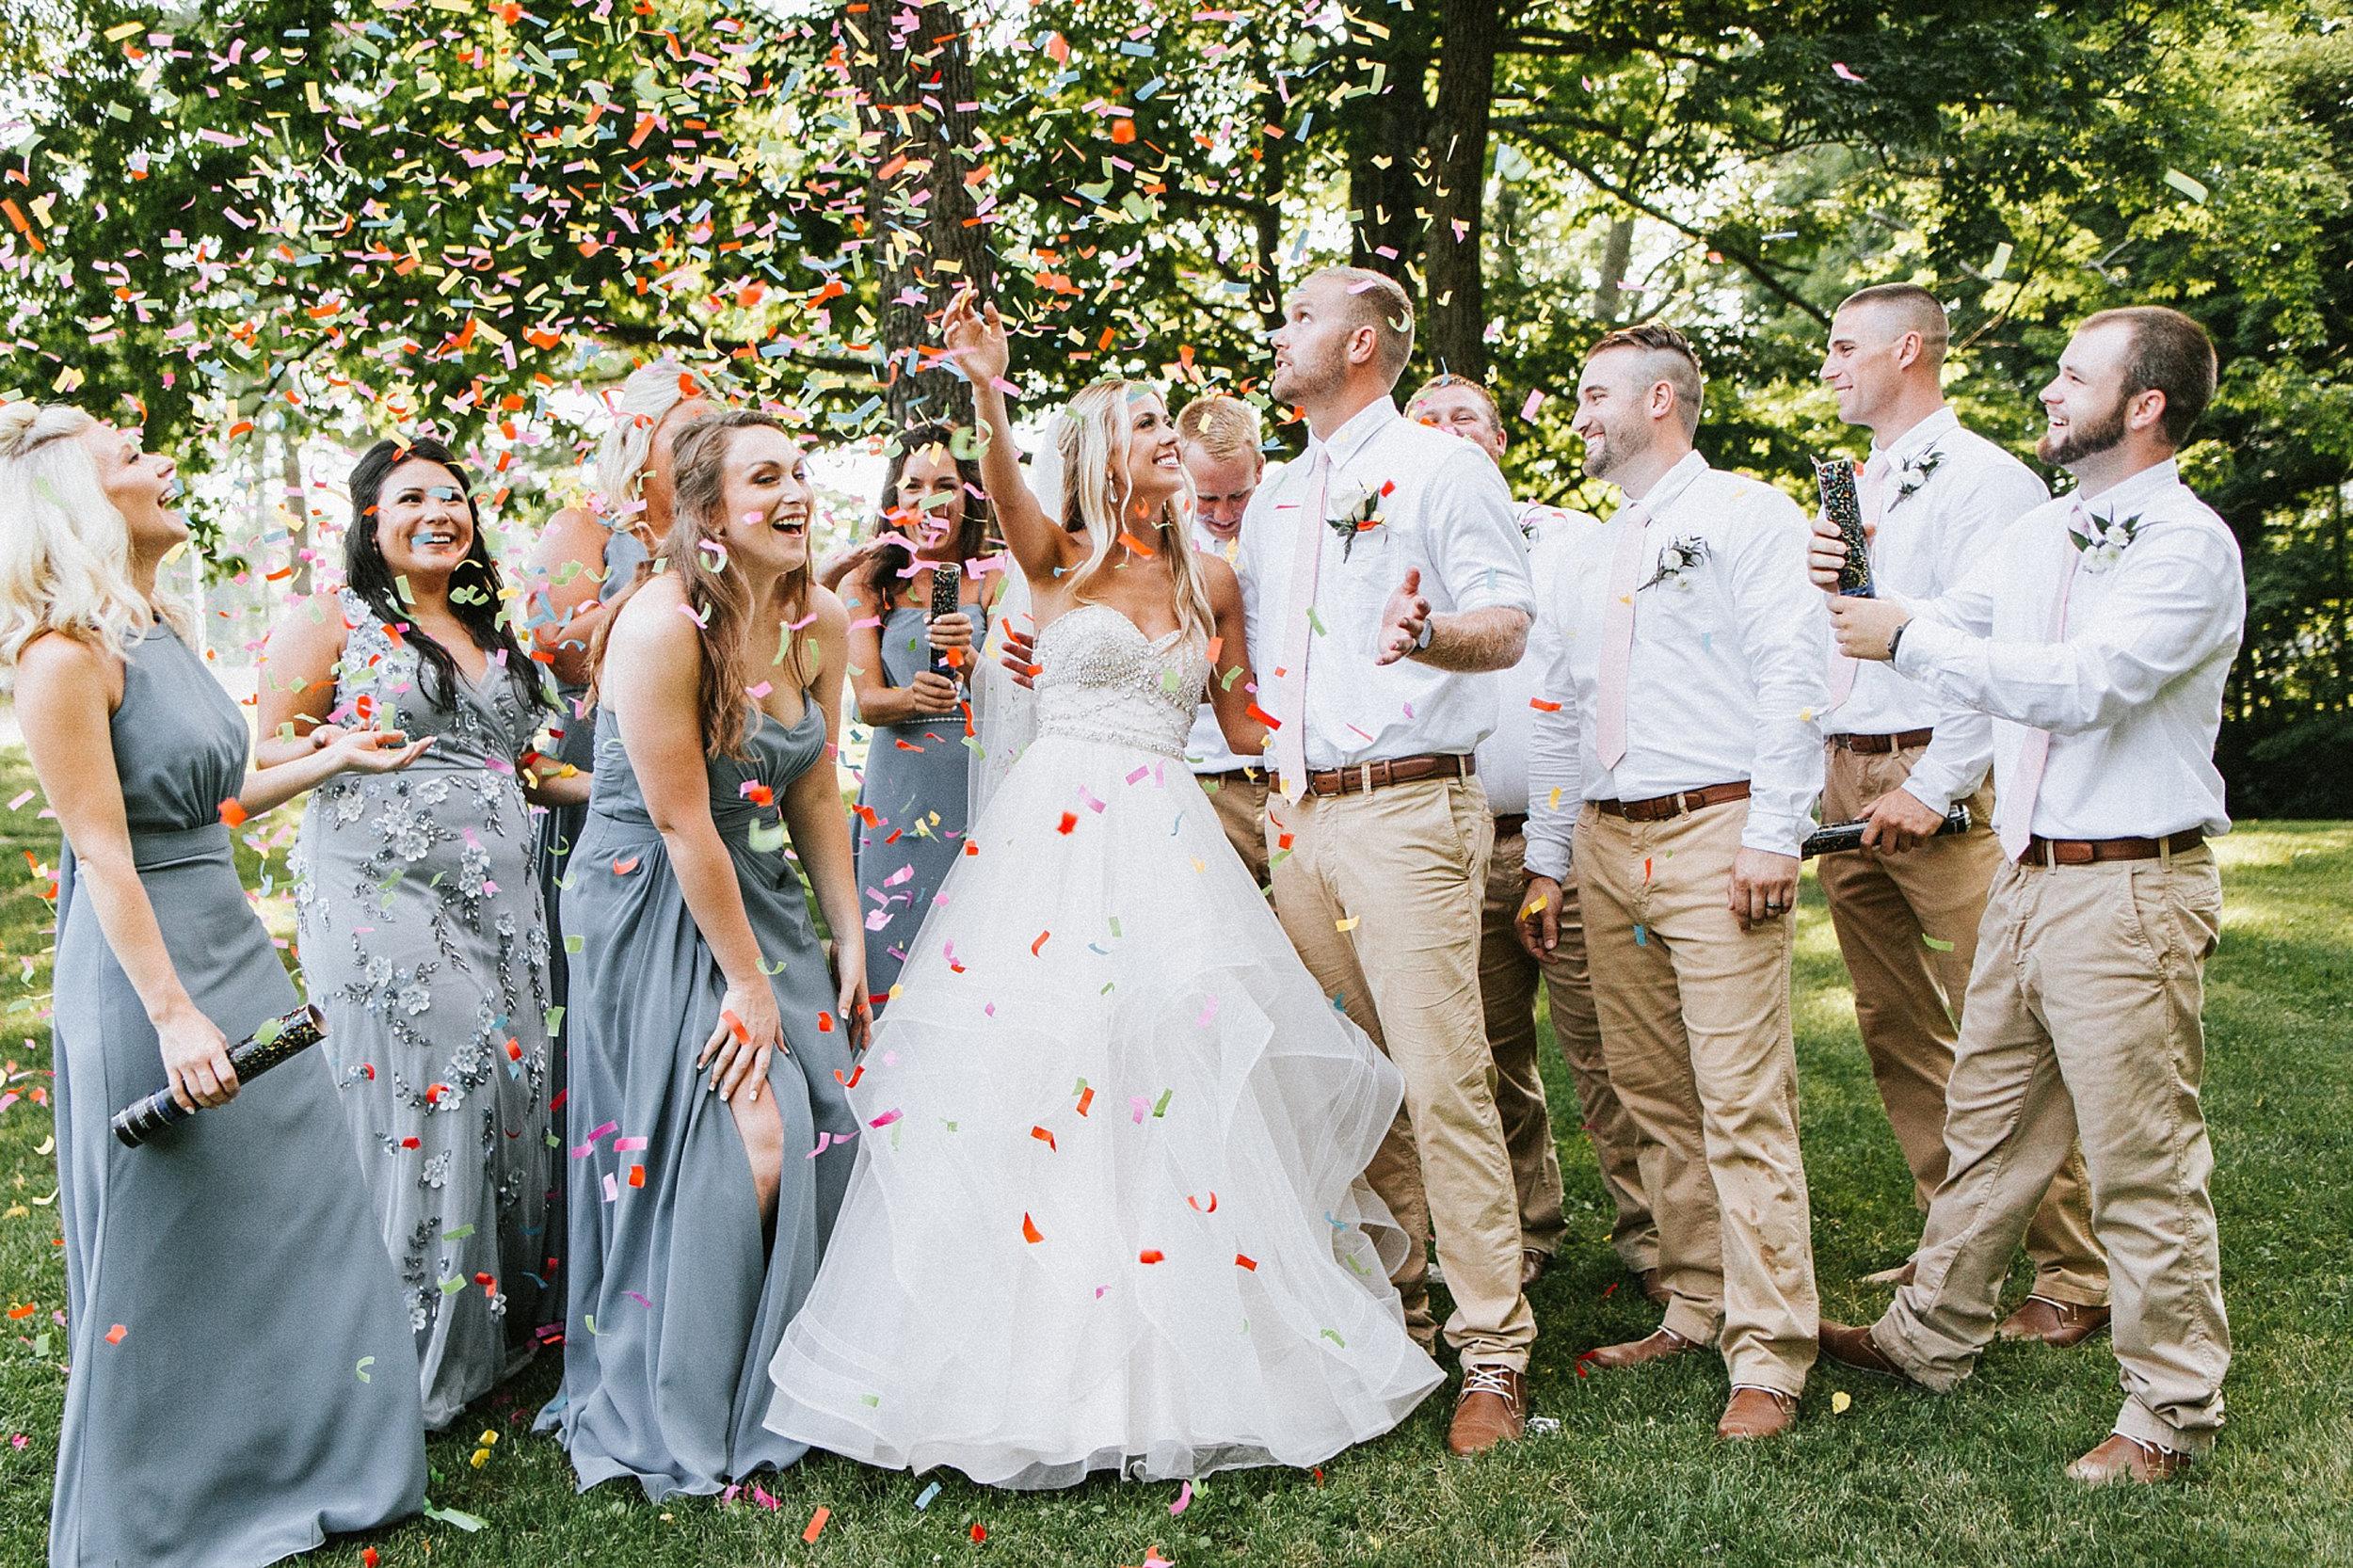 Brooke Townsend Photography - Cincinnati Wedding Photographer (89 of 153).jpg